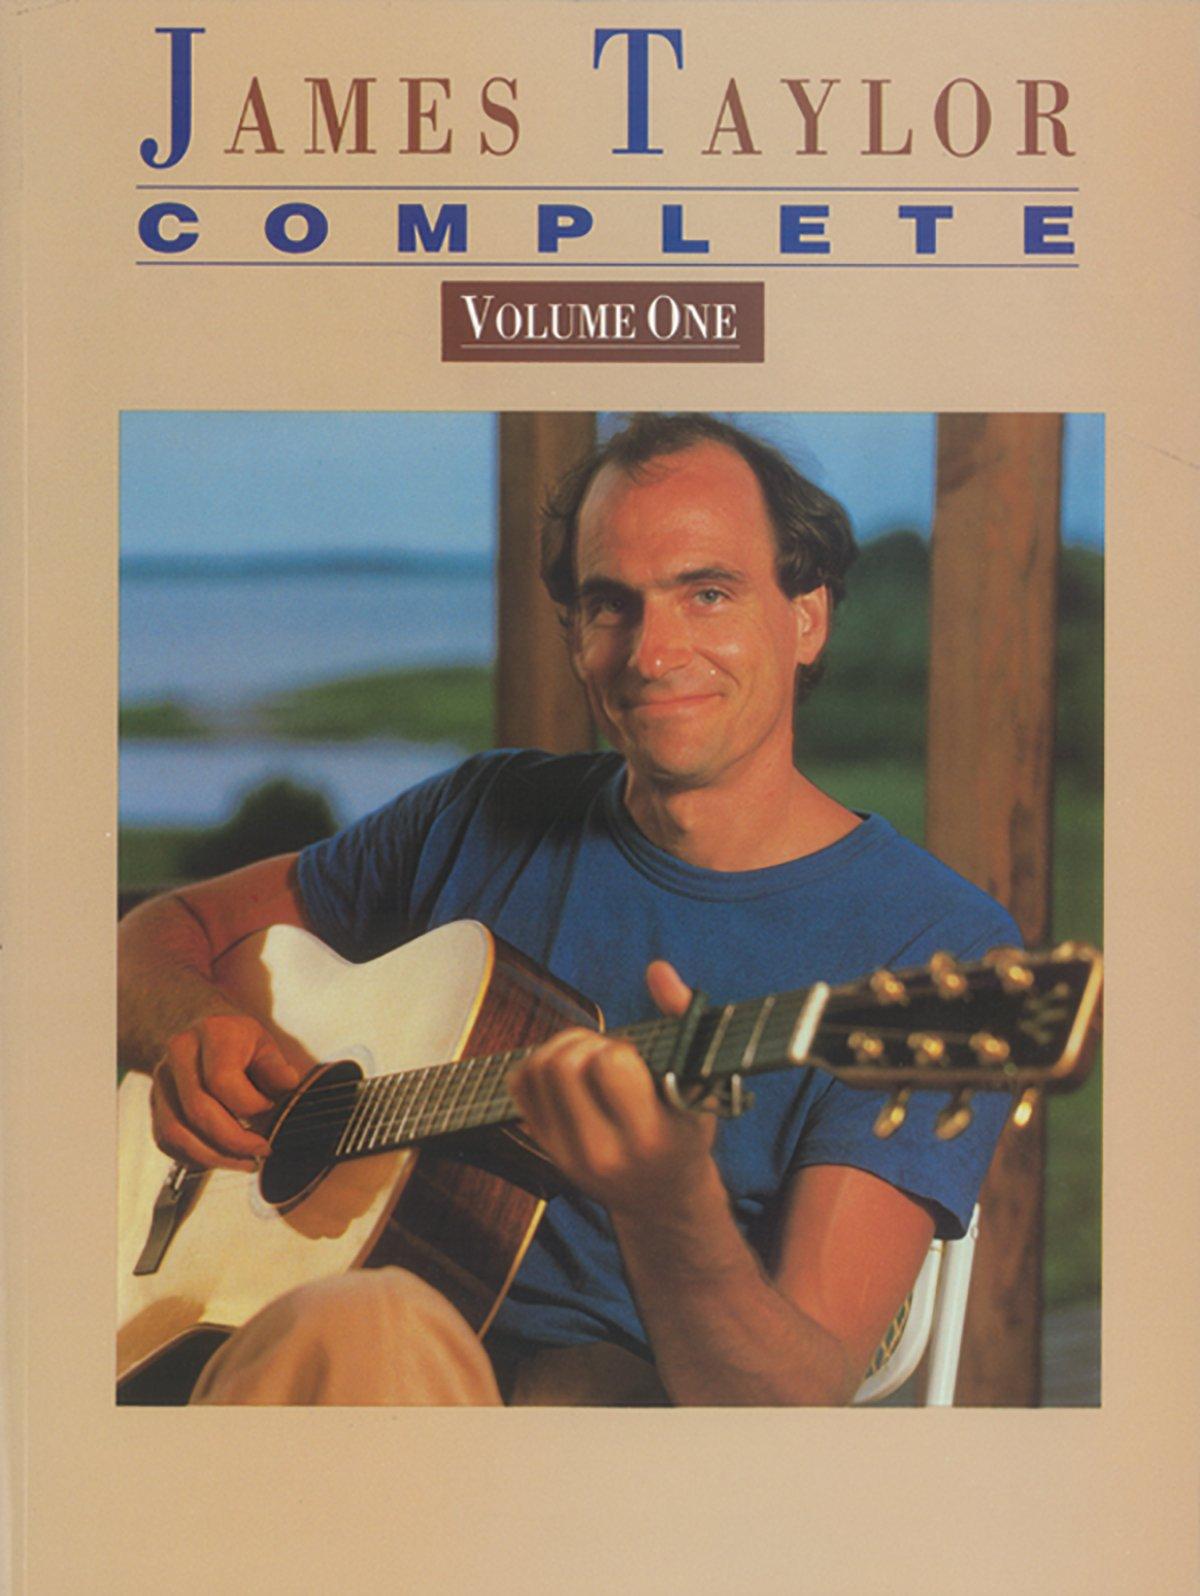 James Taylor Complete, Volume One